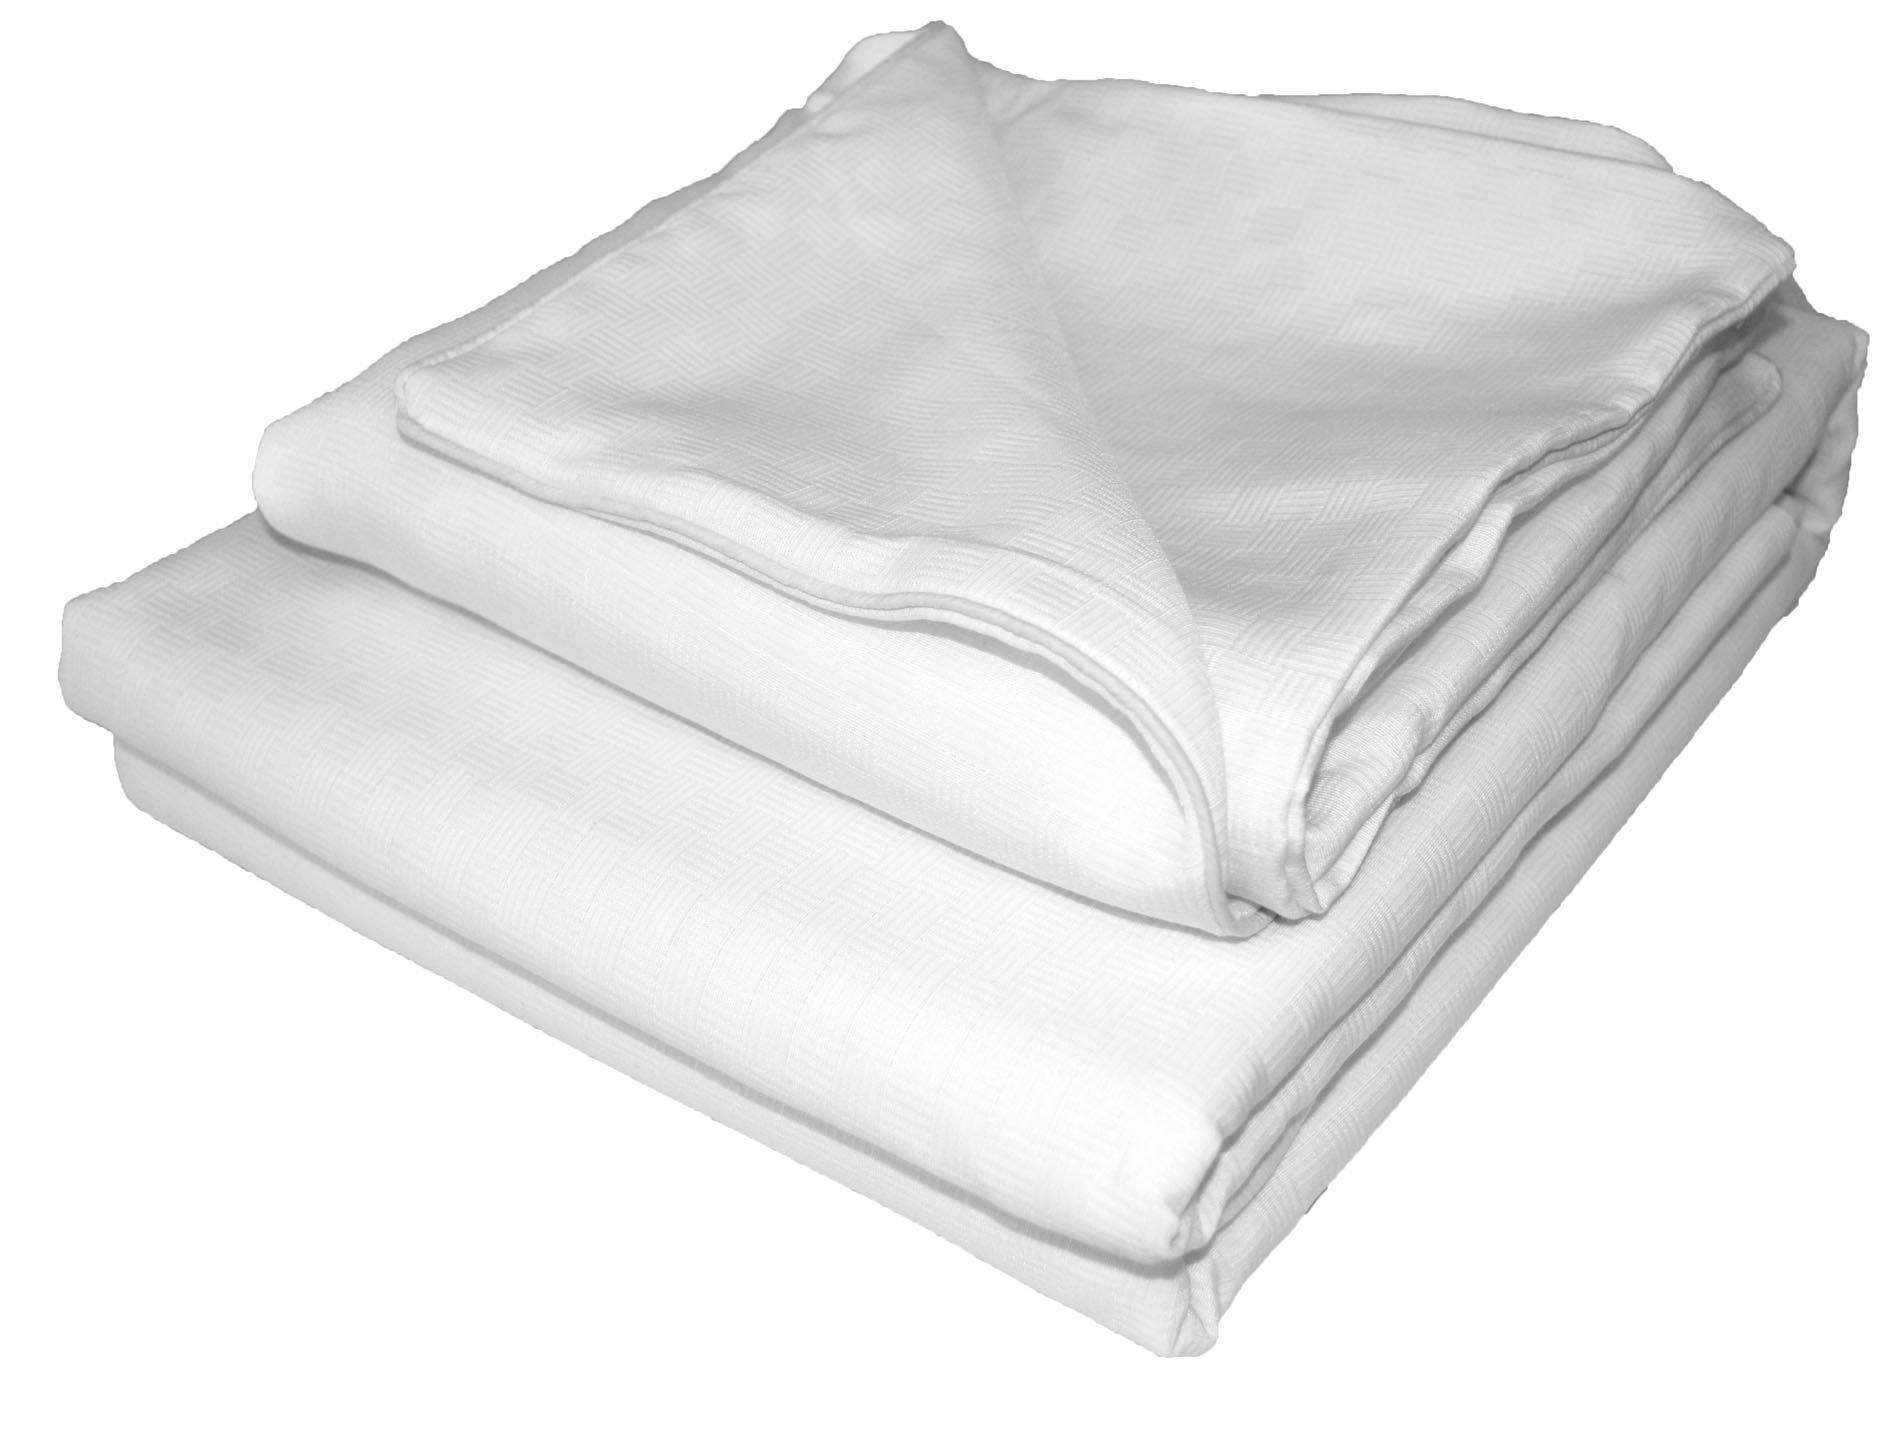 duvet black matelasse cover size vtage and white bedspread california bedspreads coverlet king frge comforter sale charles